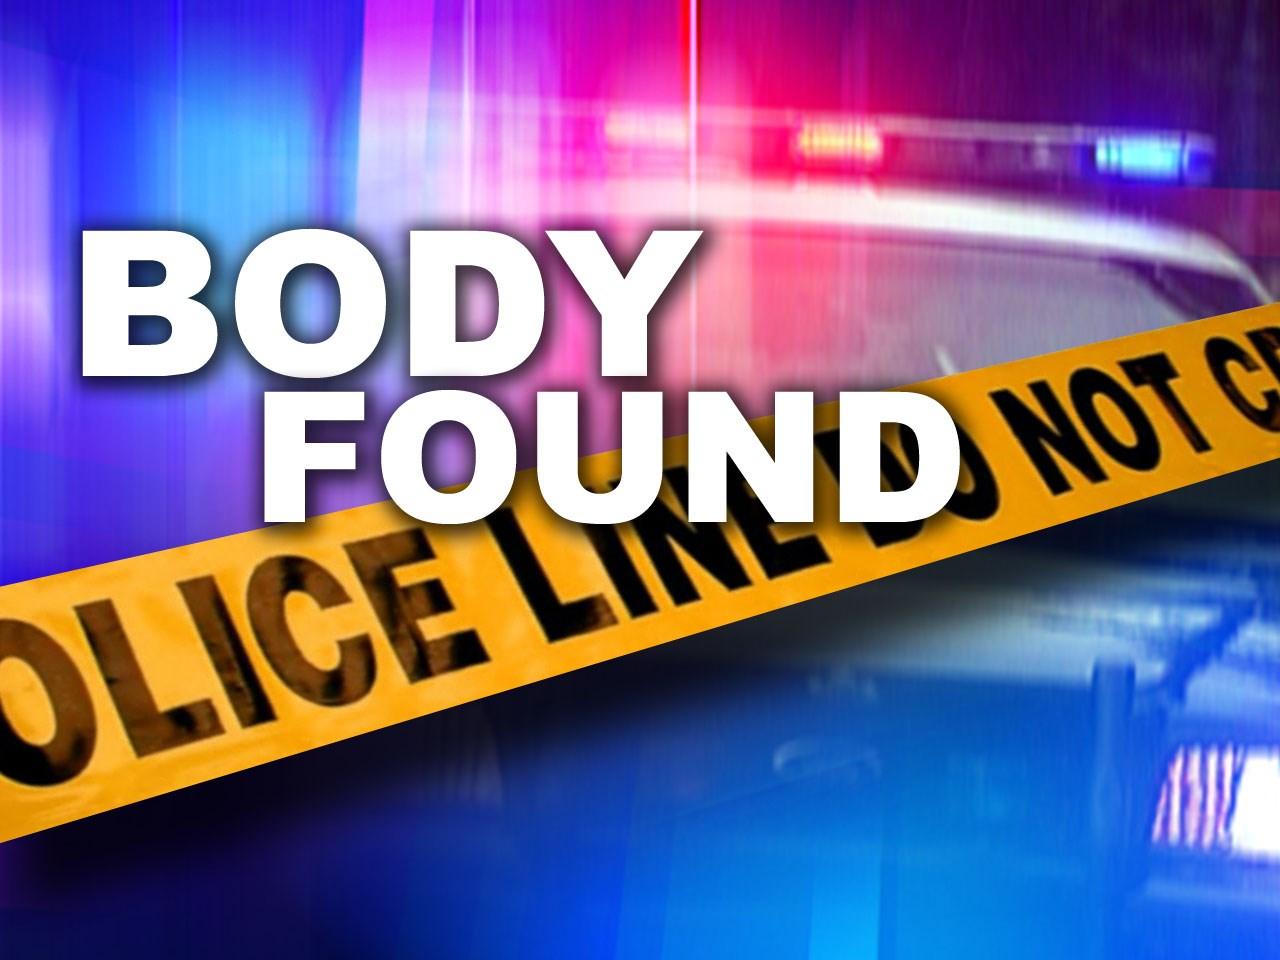 Body found_.jpg